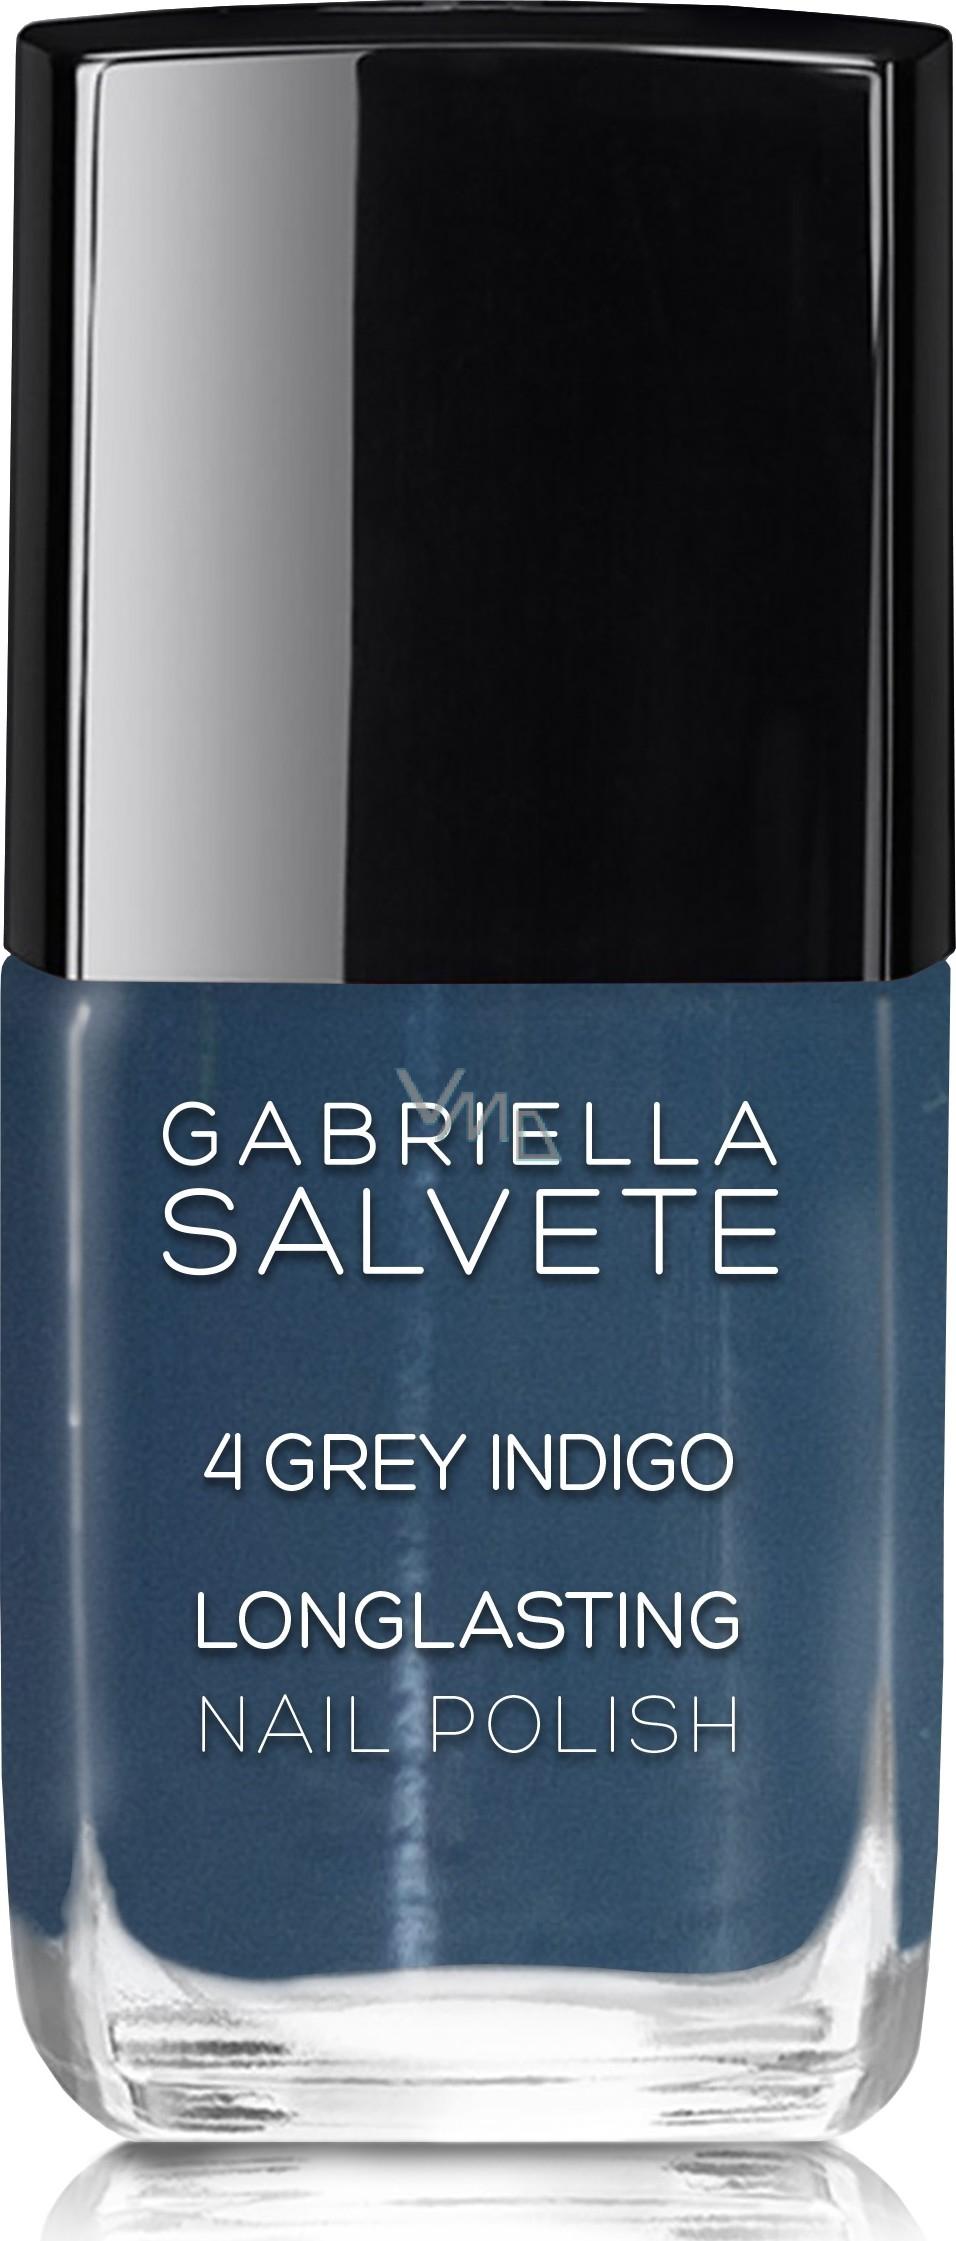 Gabriella Salvete Longlasting Enamel Long Lasting High Gloss Nail Polish 04 Gray Indigo 11 Ml Vmd Parfumerie Drogerie